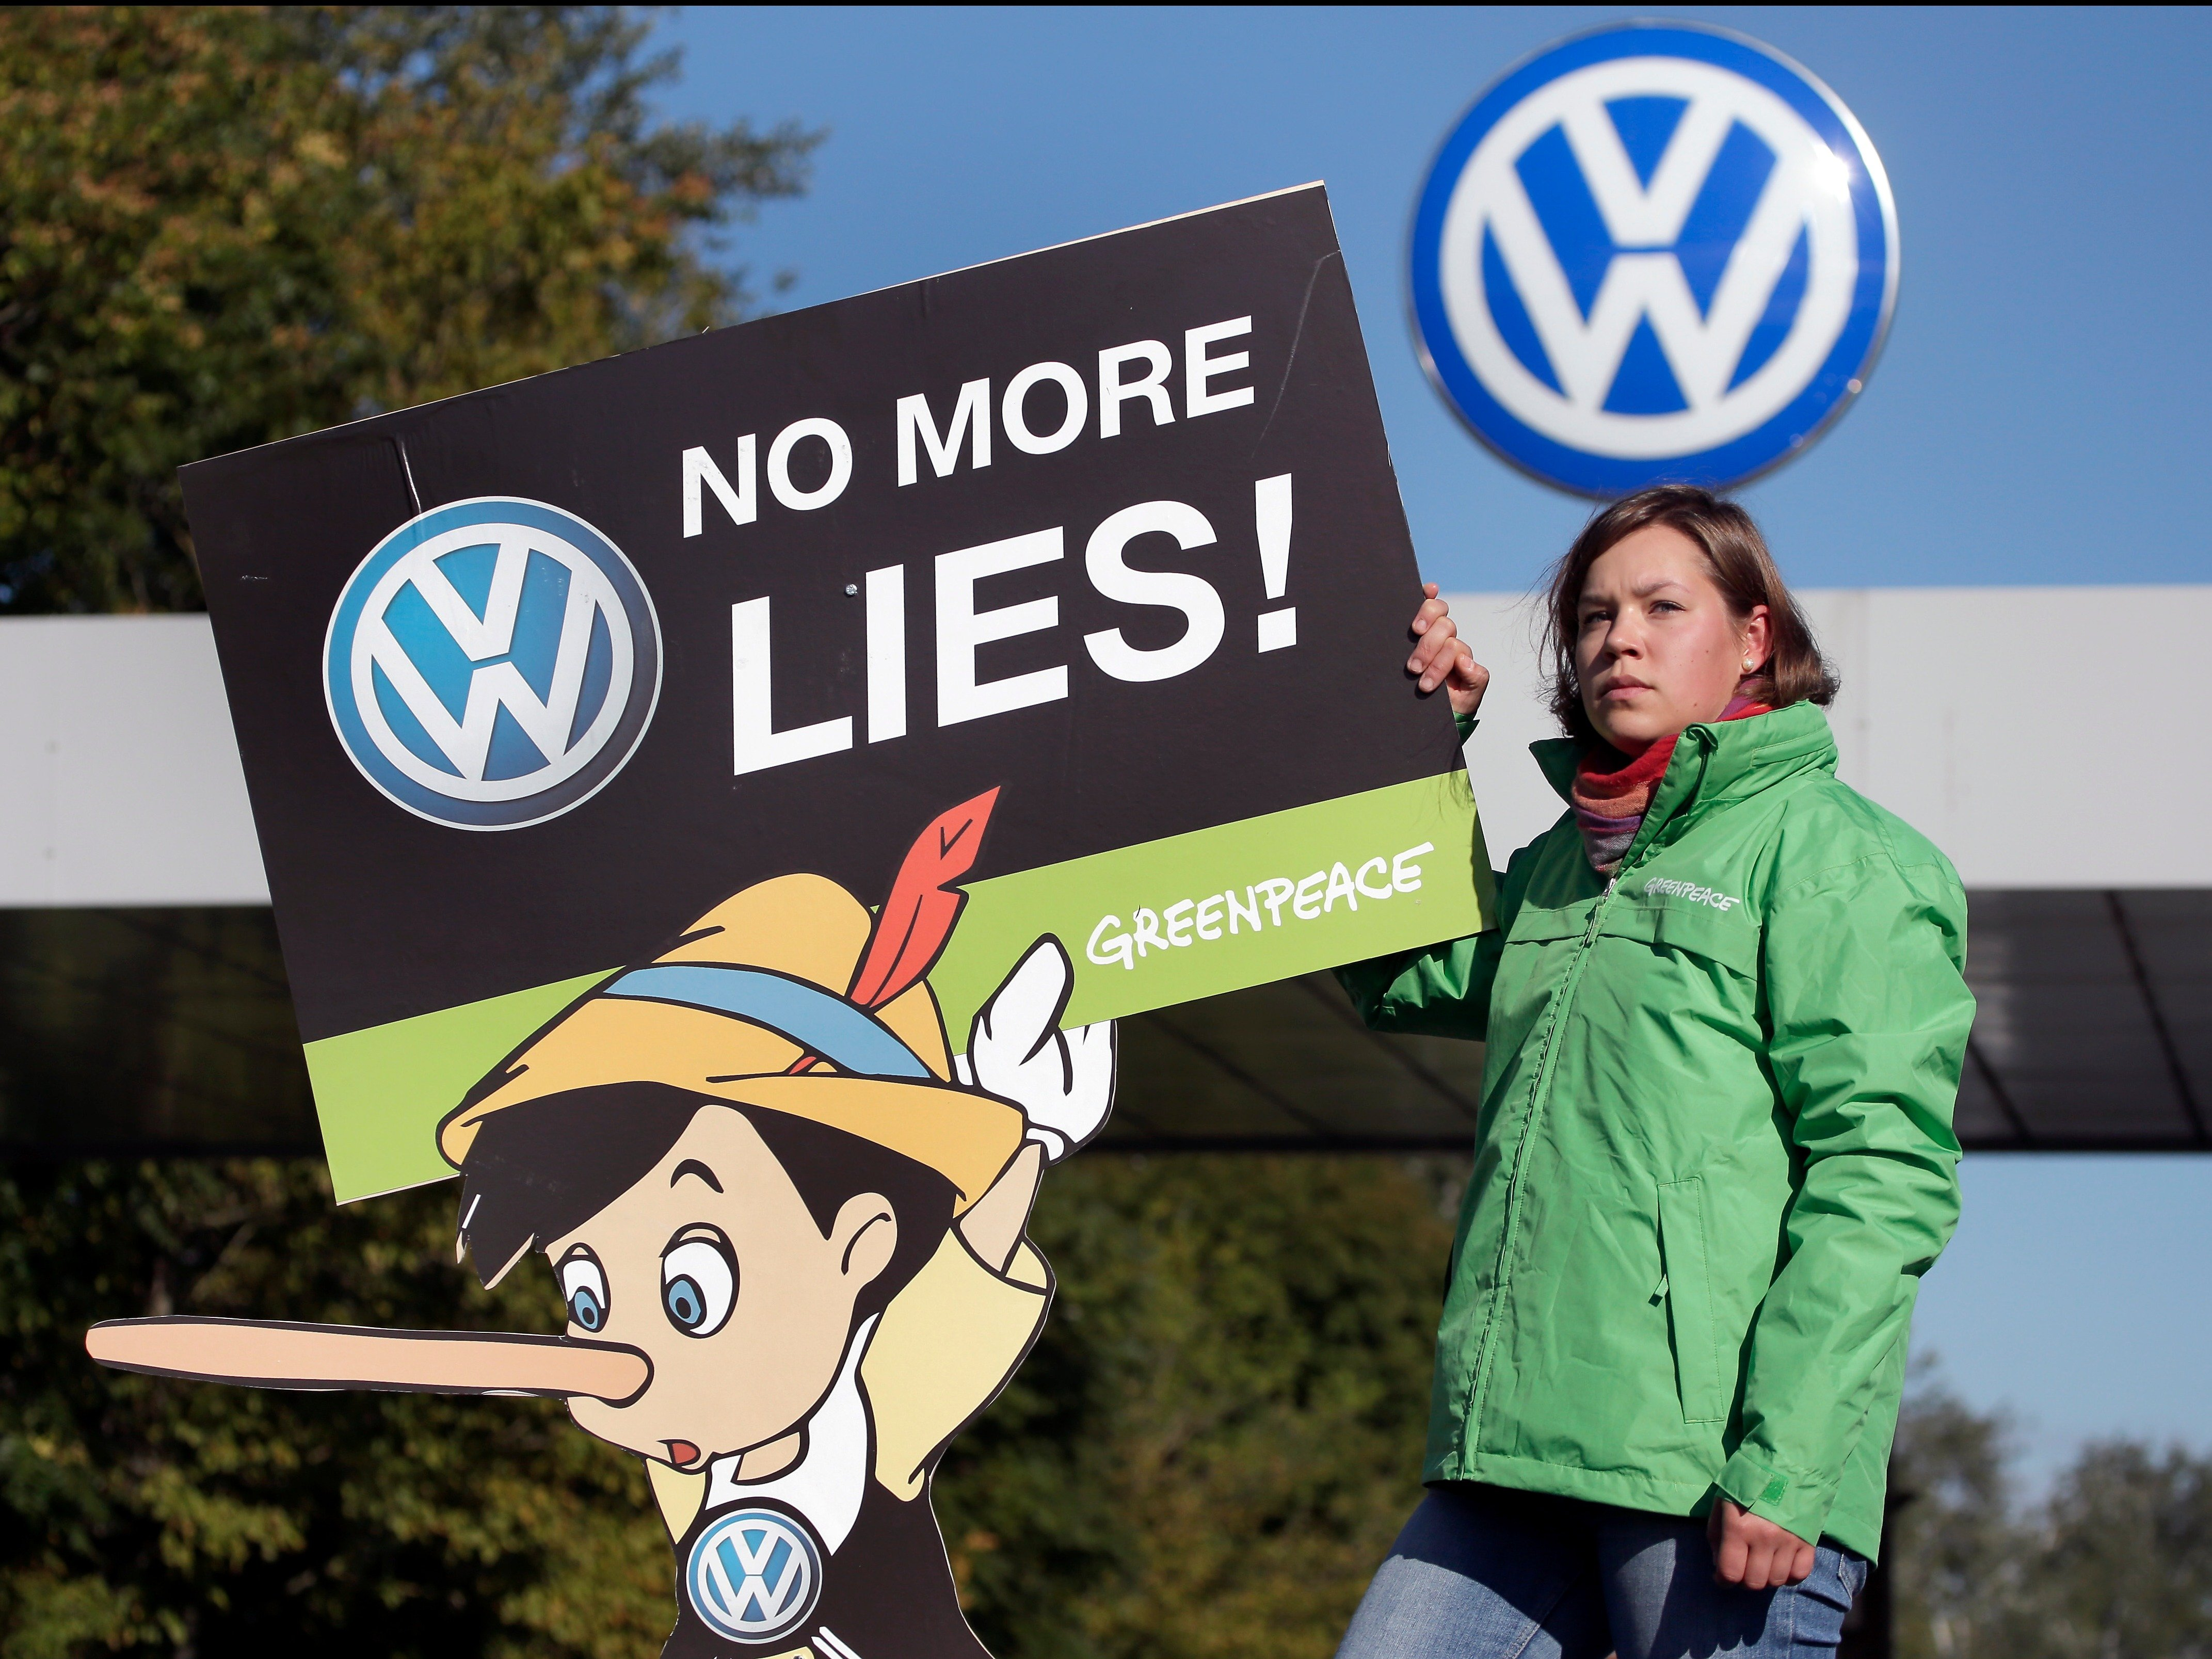 Photo of Volkswagen yok artık dedirtti!